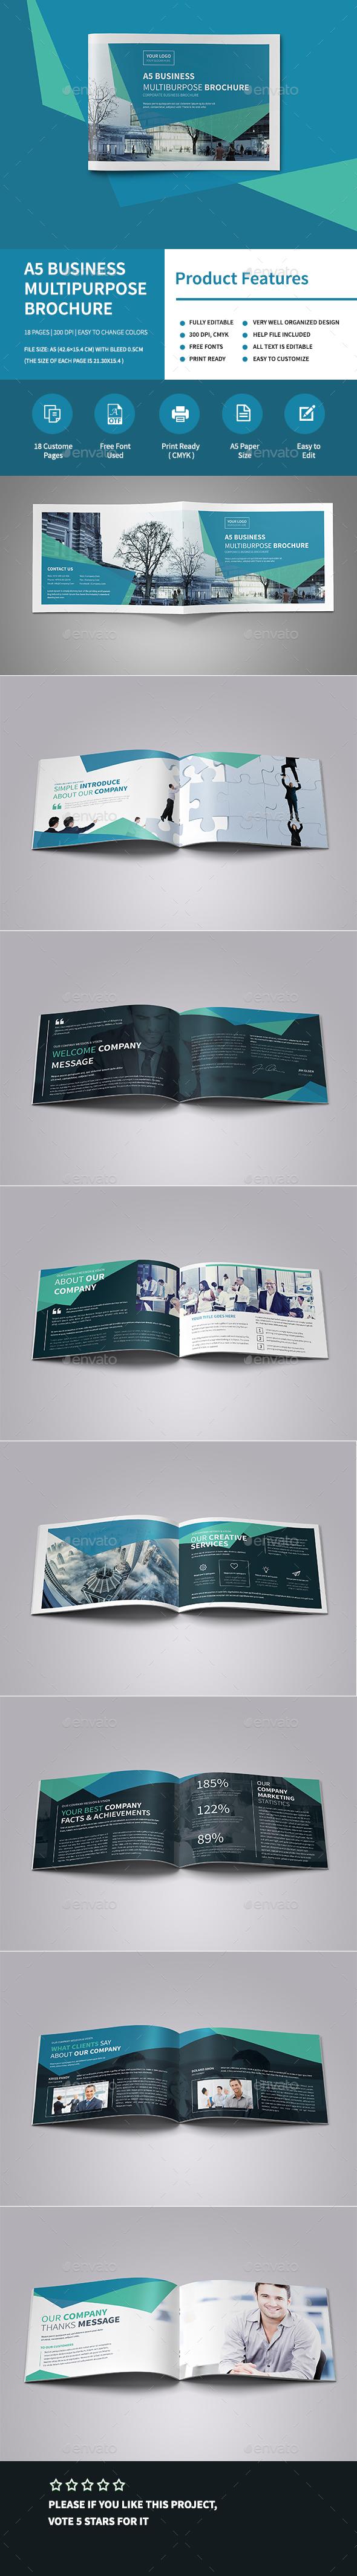 A5 Business Multipurpose Brochure - Corporate Brochures